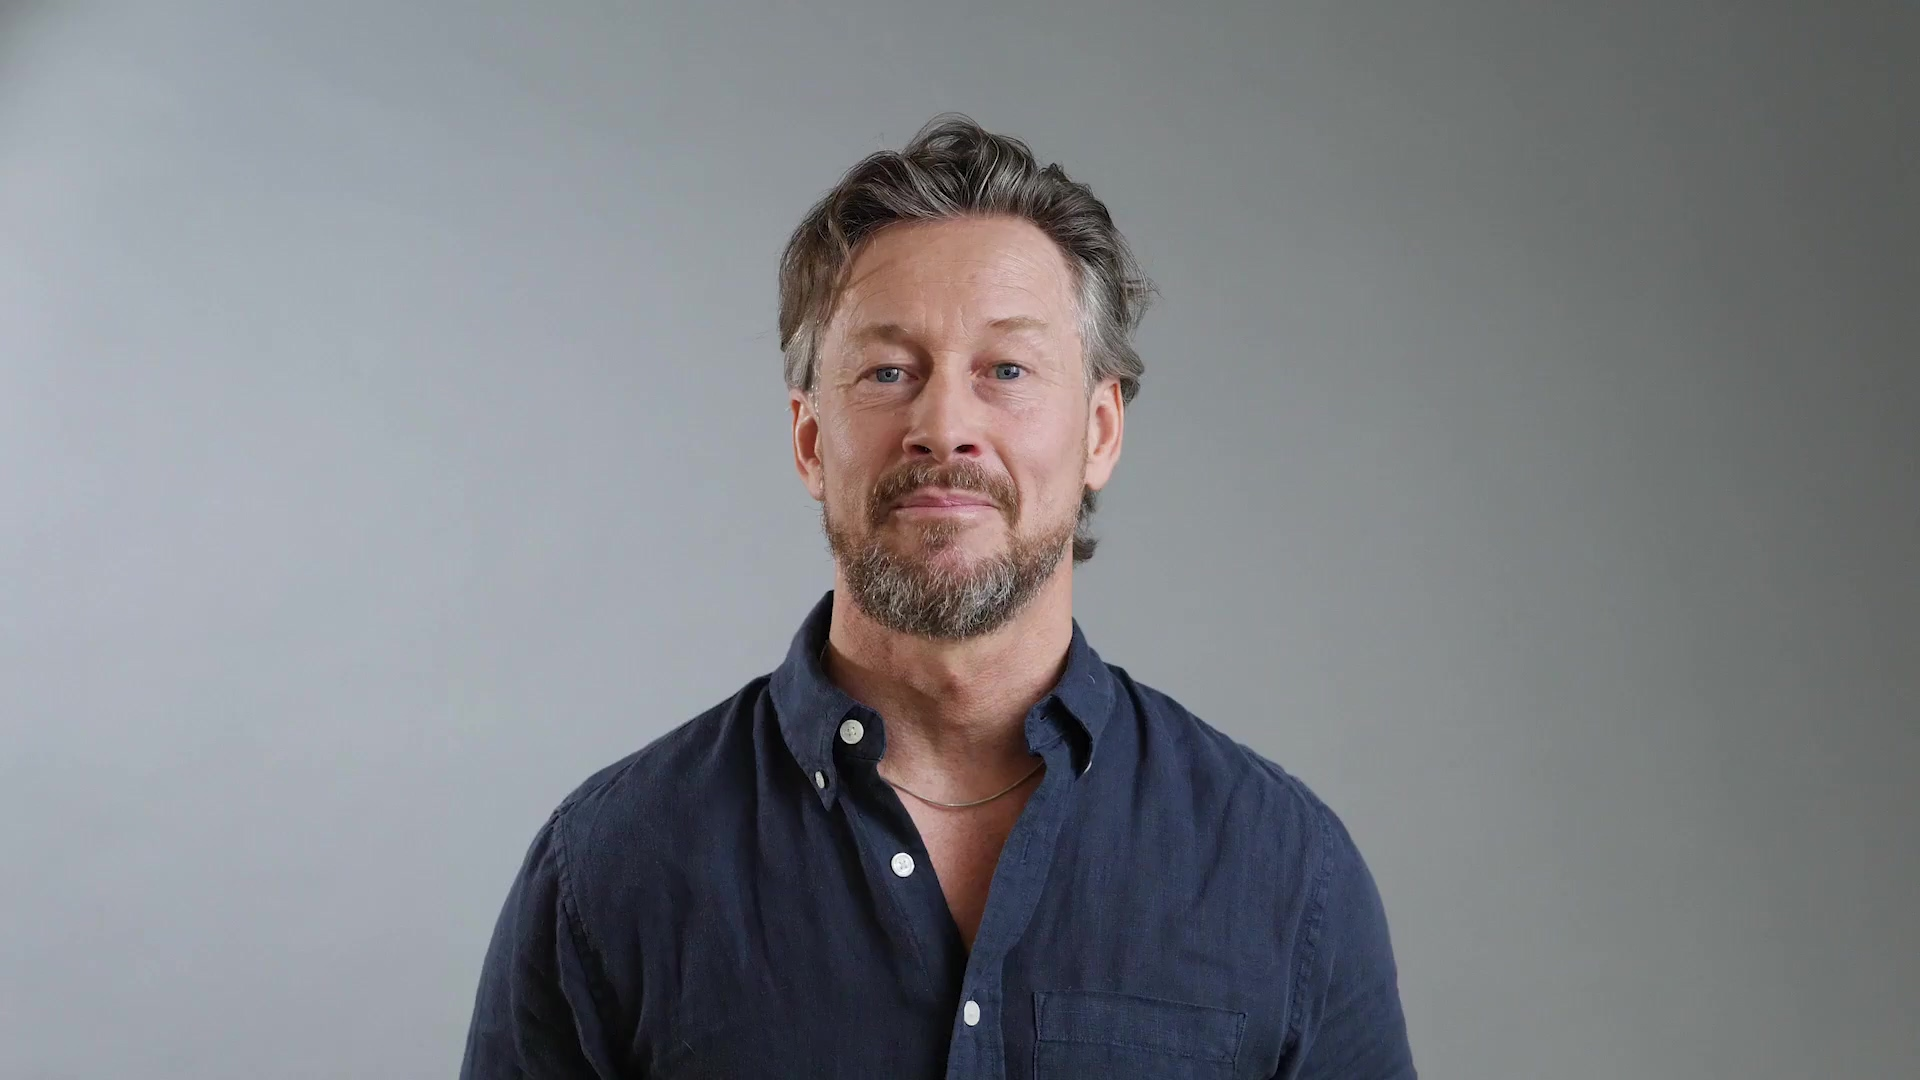 Lars Kry